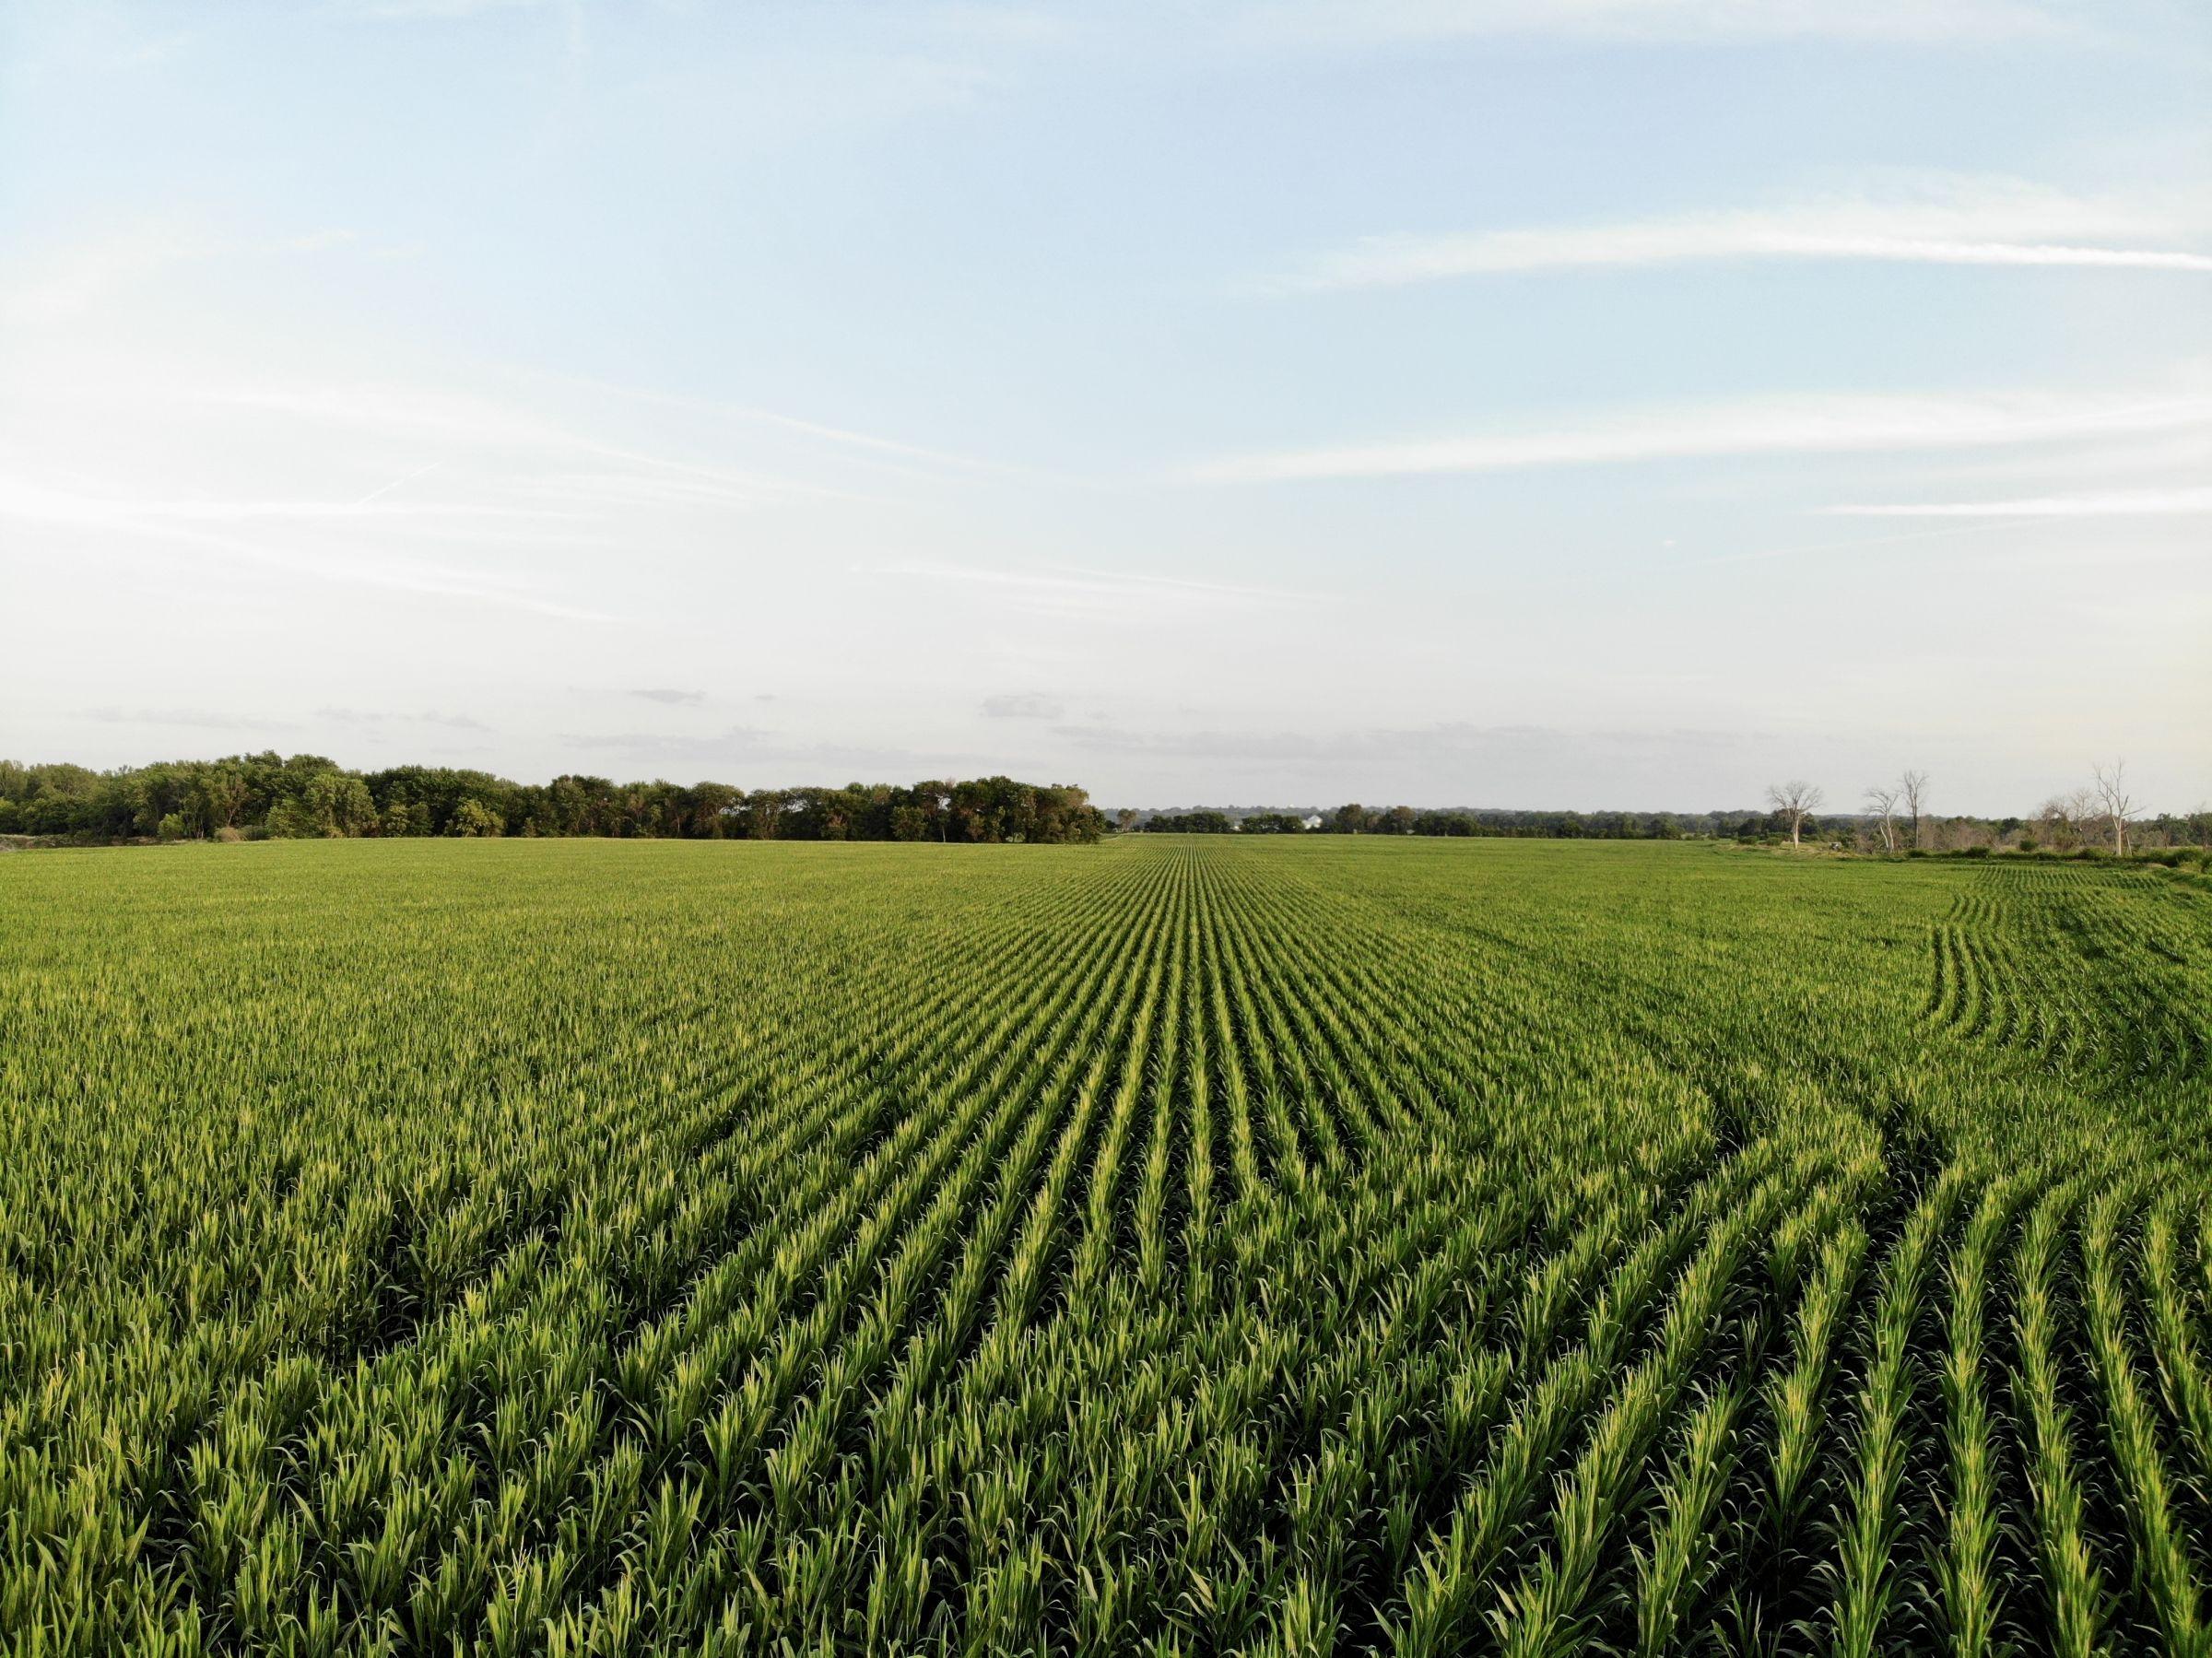 land-polk-county-iowa-202-acres-listing-number-15625-1-2021-07-09-140359.jpg